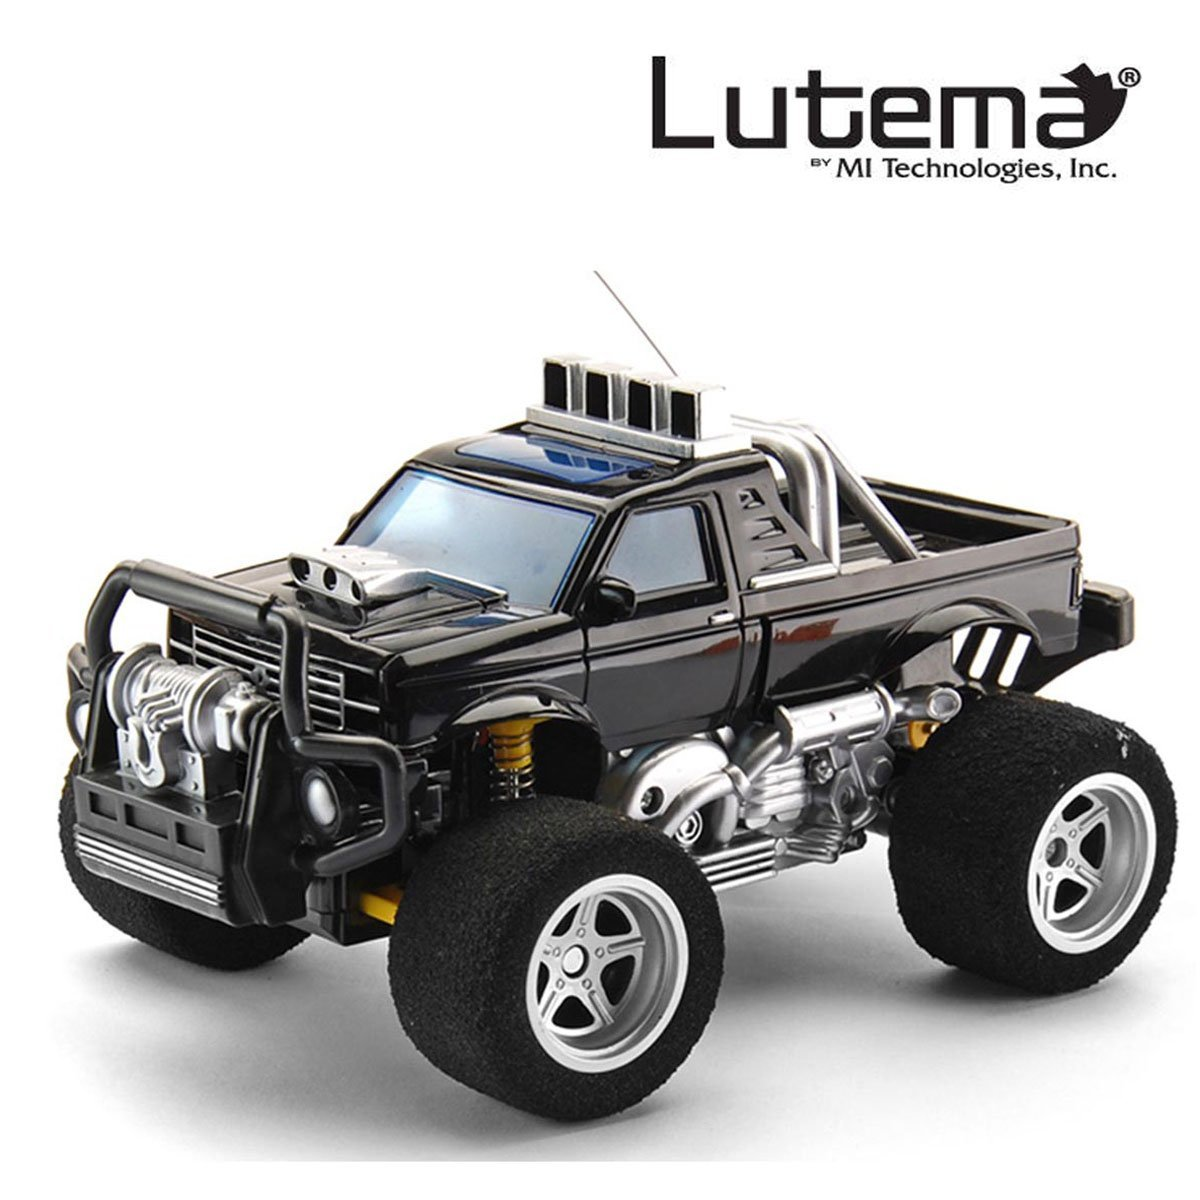 amazon com lutema big shocker 4ch remote control truck black